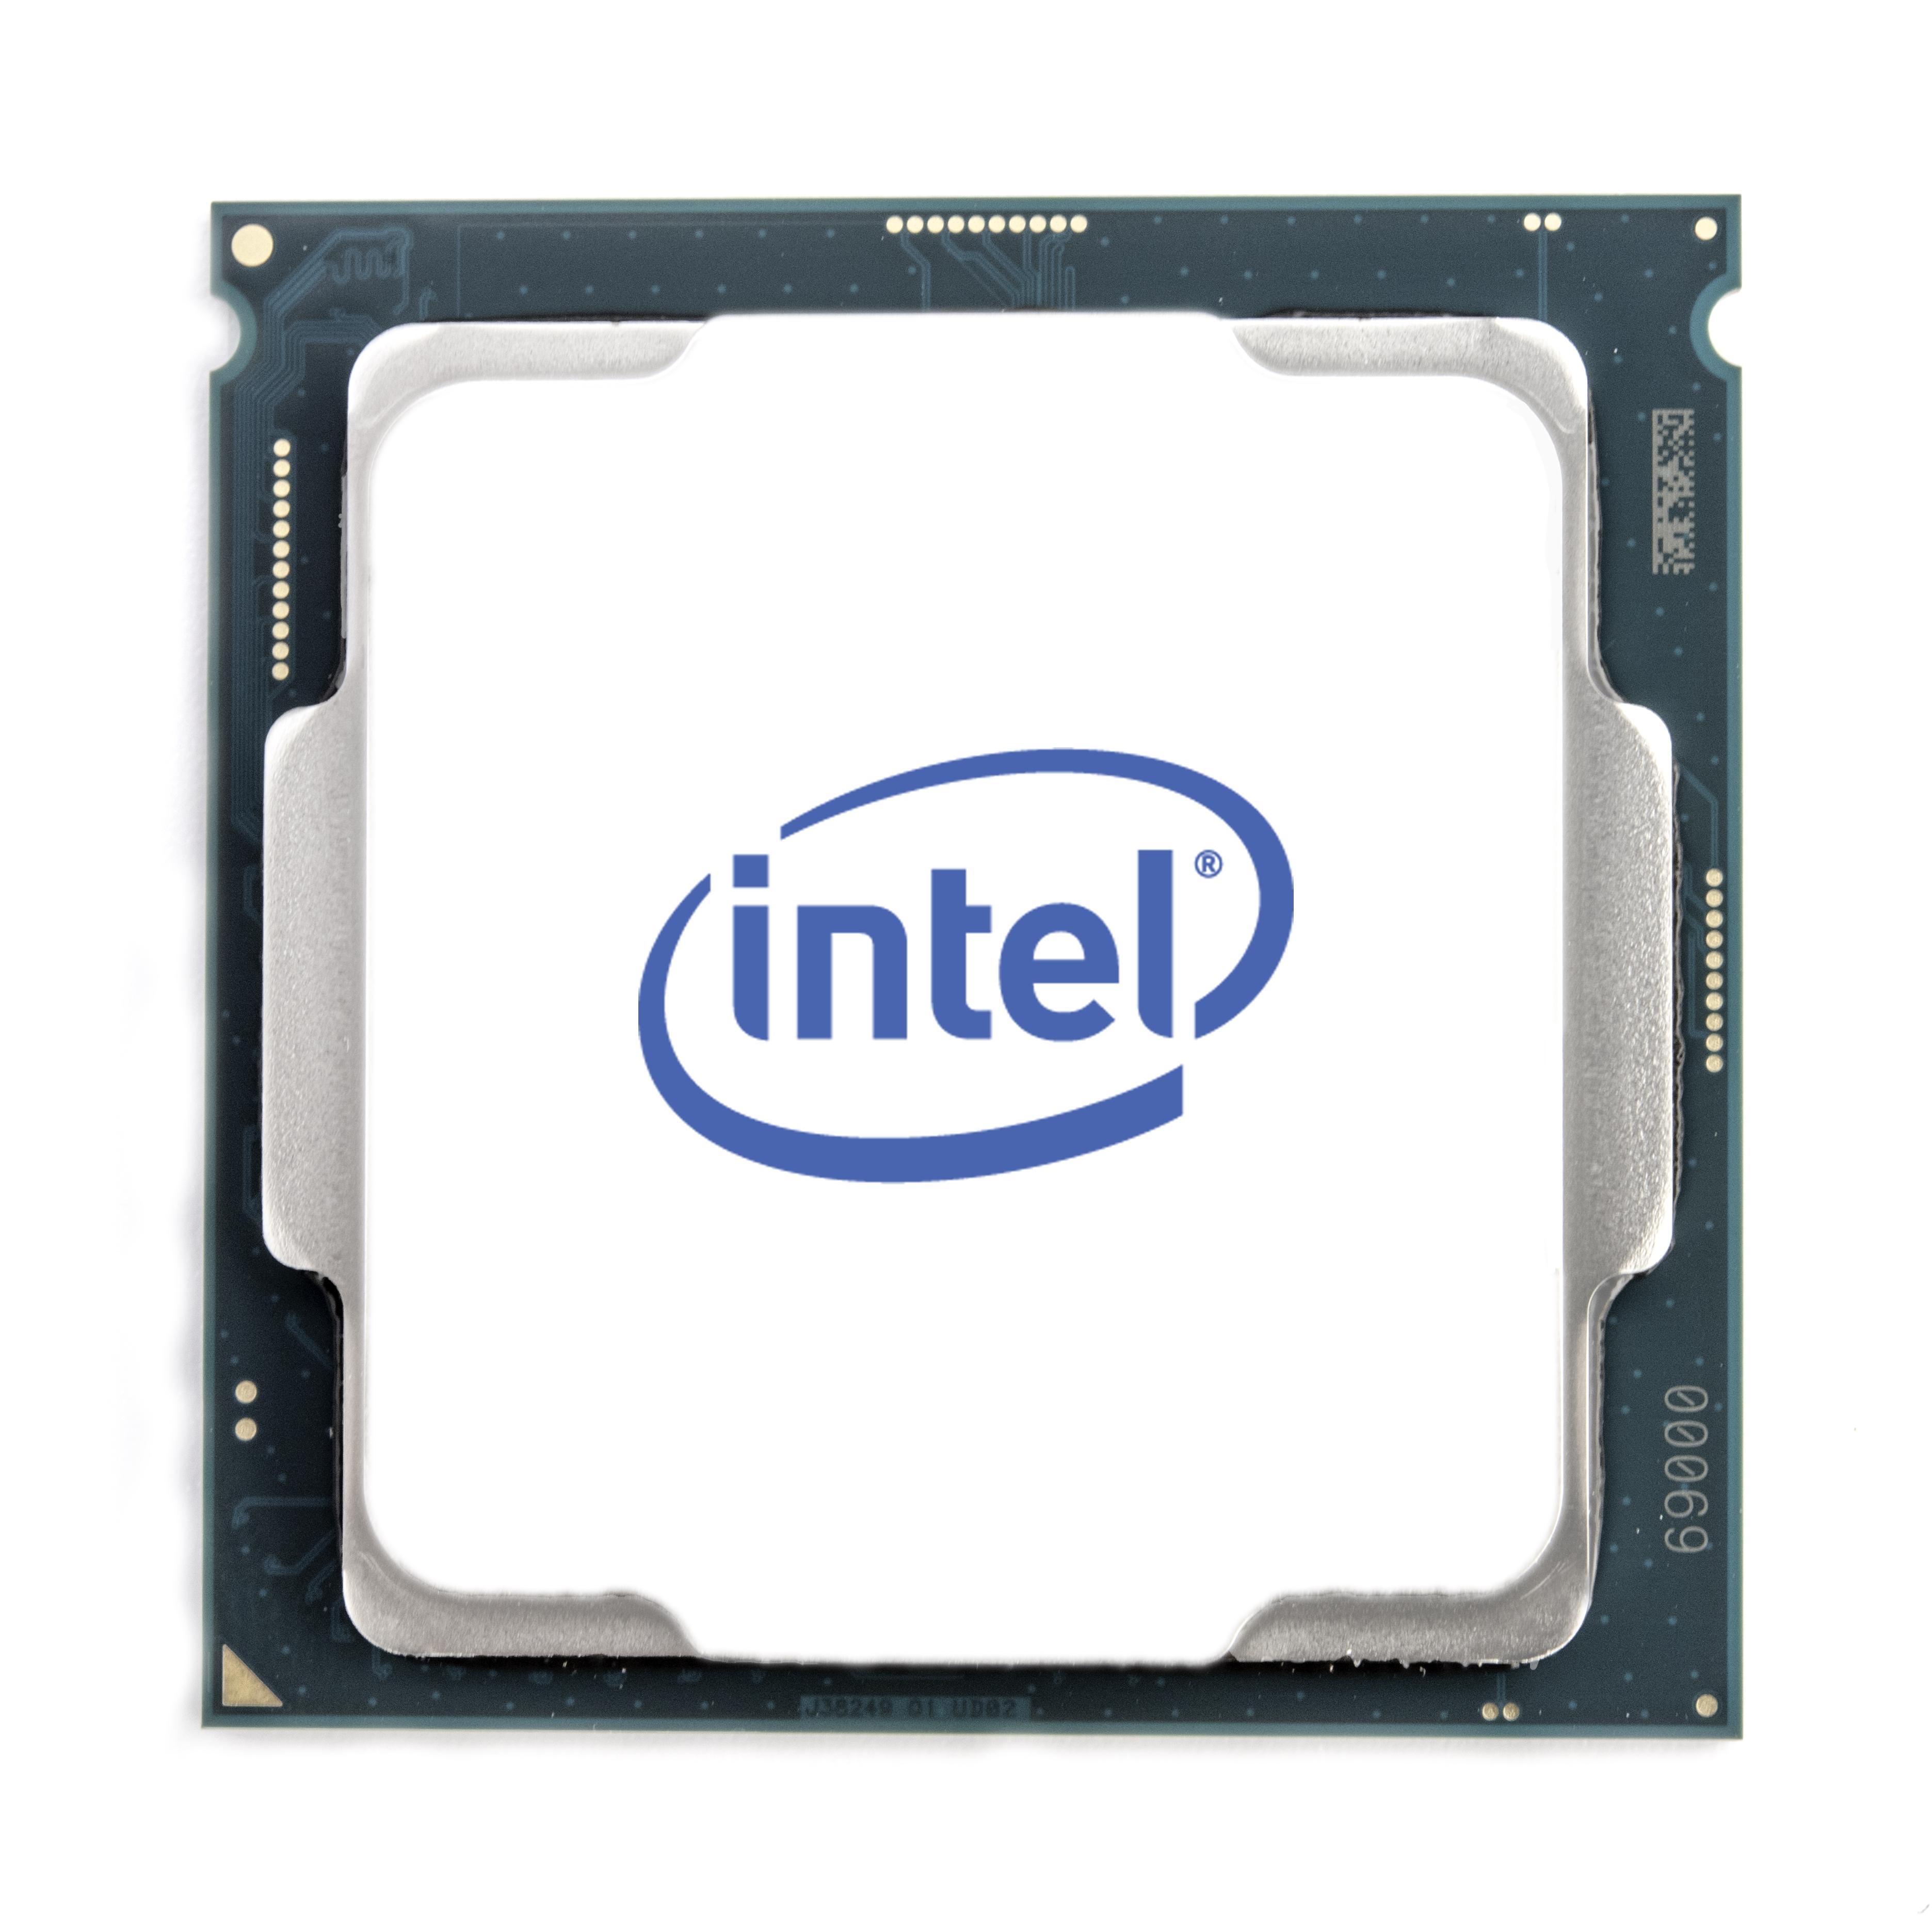 Intel Core i3-10100F - Intel? Core? i3 Prozessoren der 10. Generation - LGA 1200 (Socket H5) - PC - 14 nm - Intel - 3,6